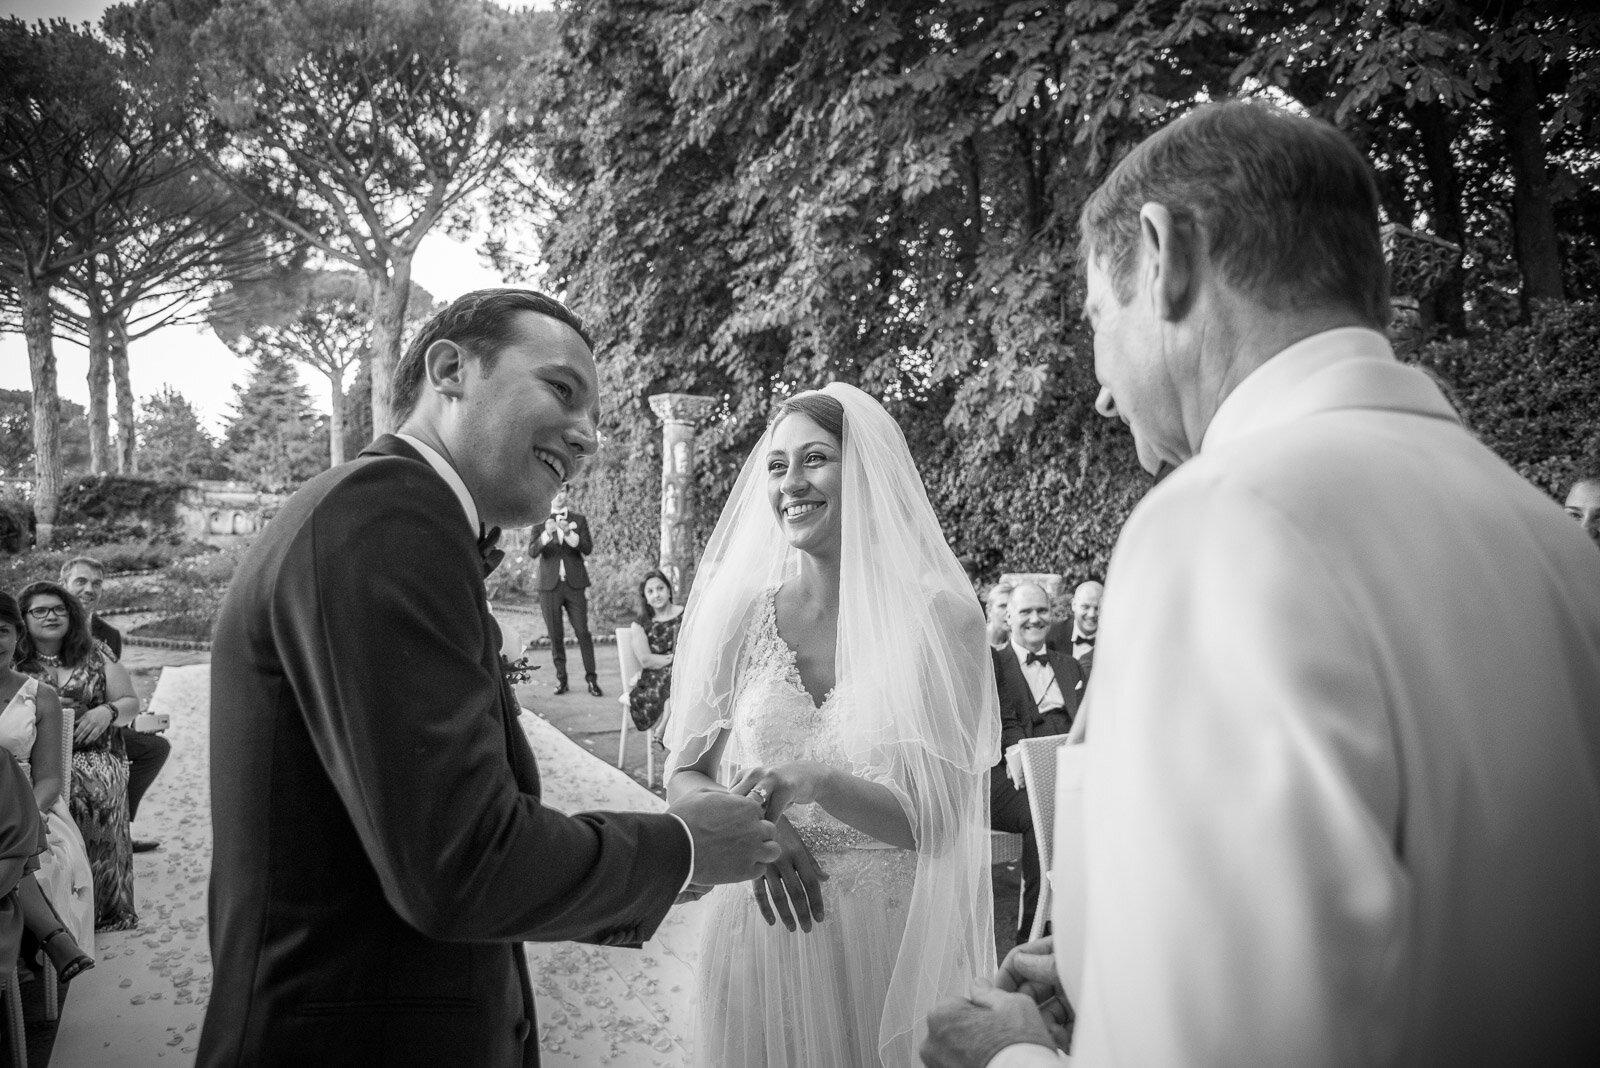 Russian Wedding in Villa Cimbrone Costiera Amalfitana 12.jpg